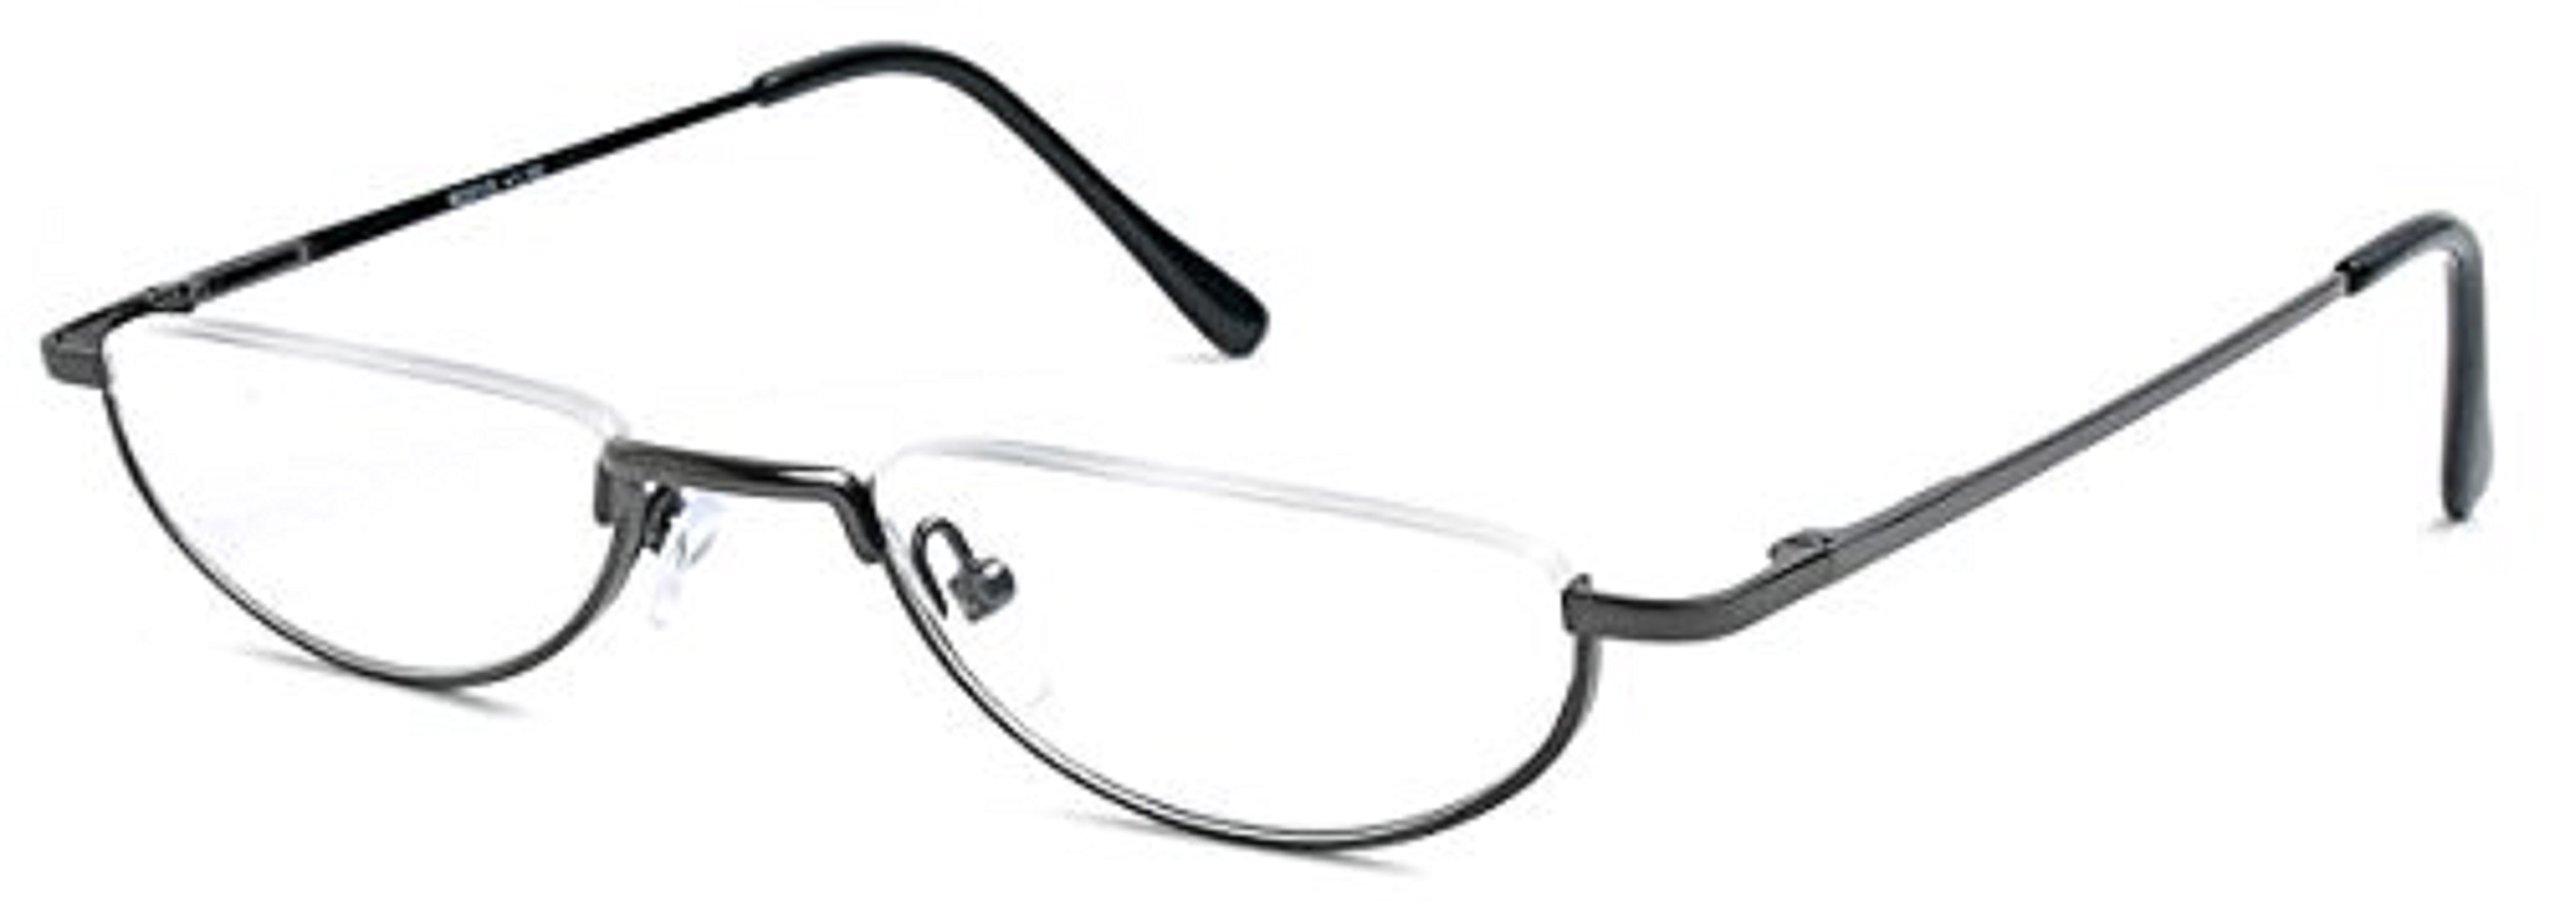 ddbf5e173c0 Amazon.com  The Lynwood Unisex Half Moon Half Frame Reading Glasses ...